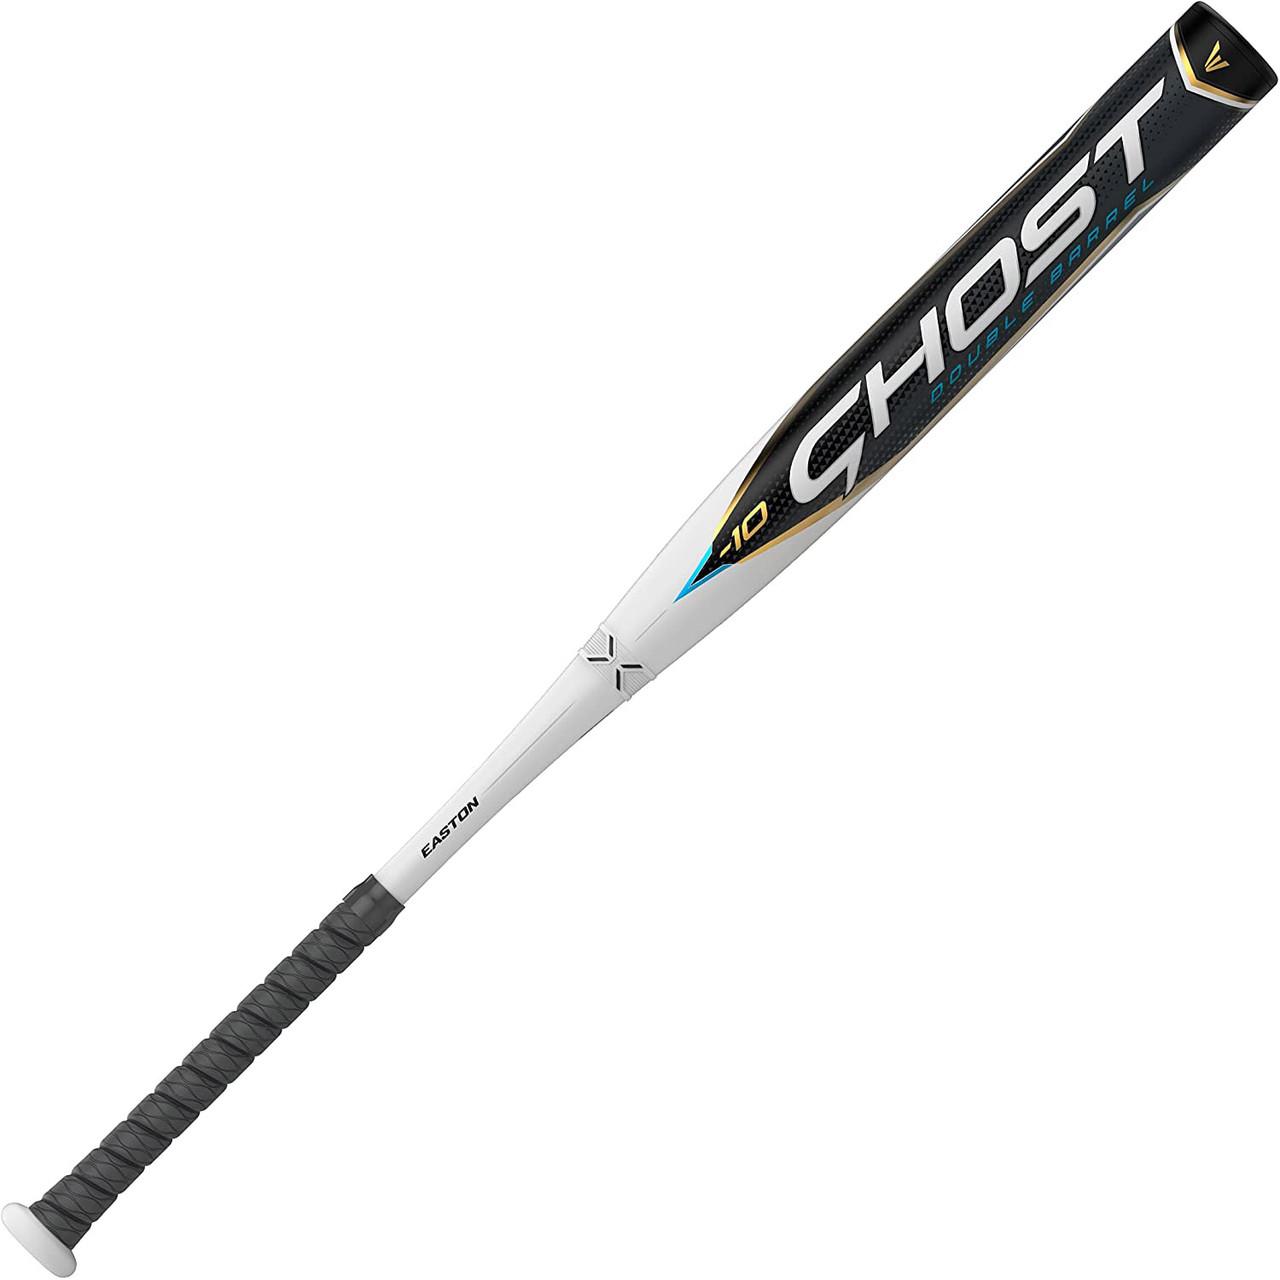 Easton 2022 Ghost Double Barrel (-10) FP22GH10 Fastpitch Softball Bat